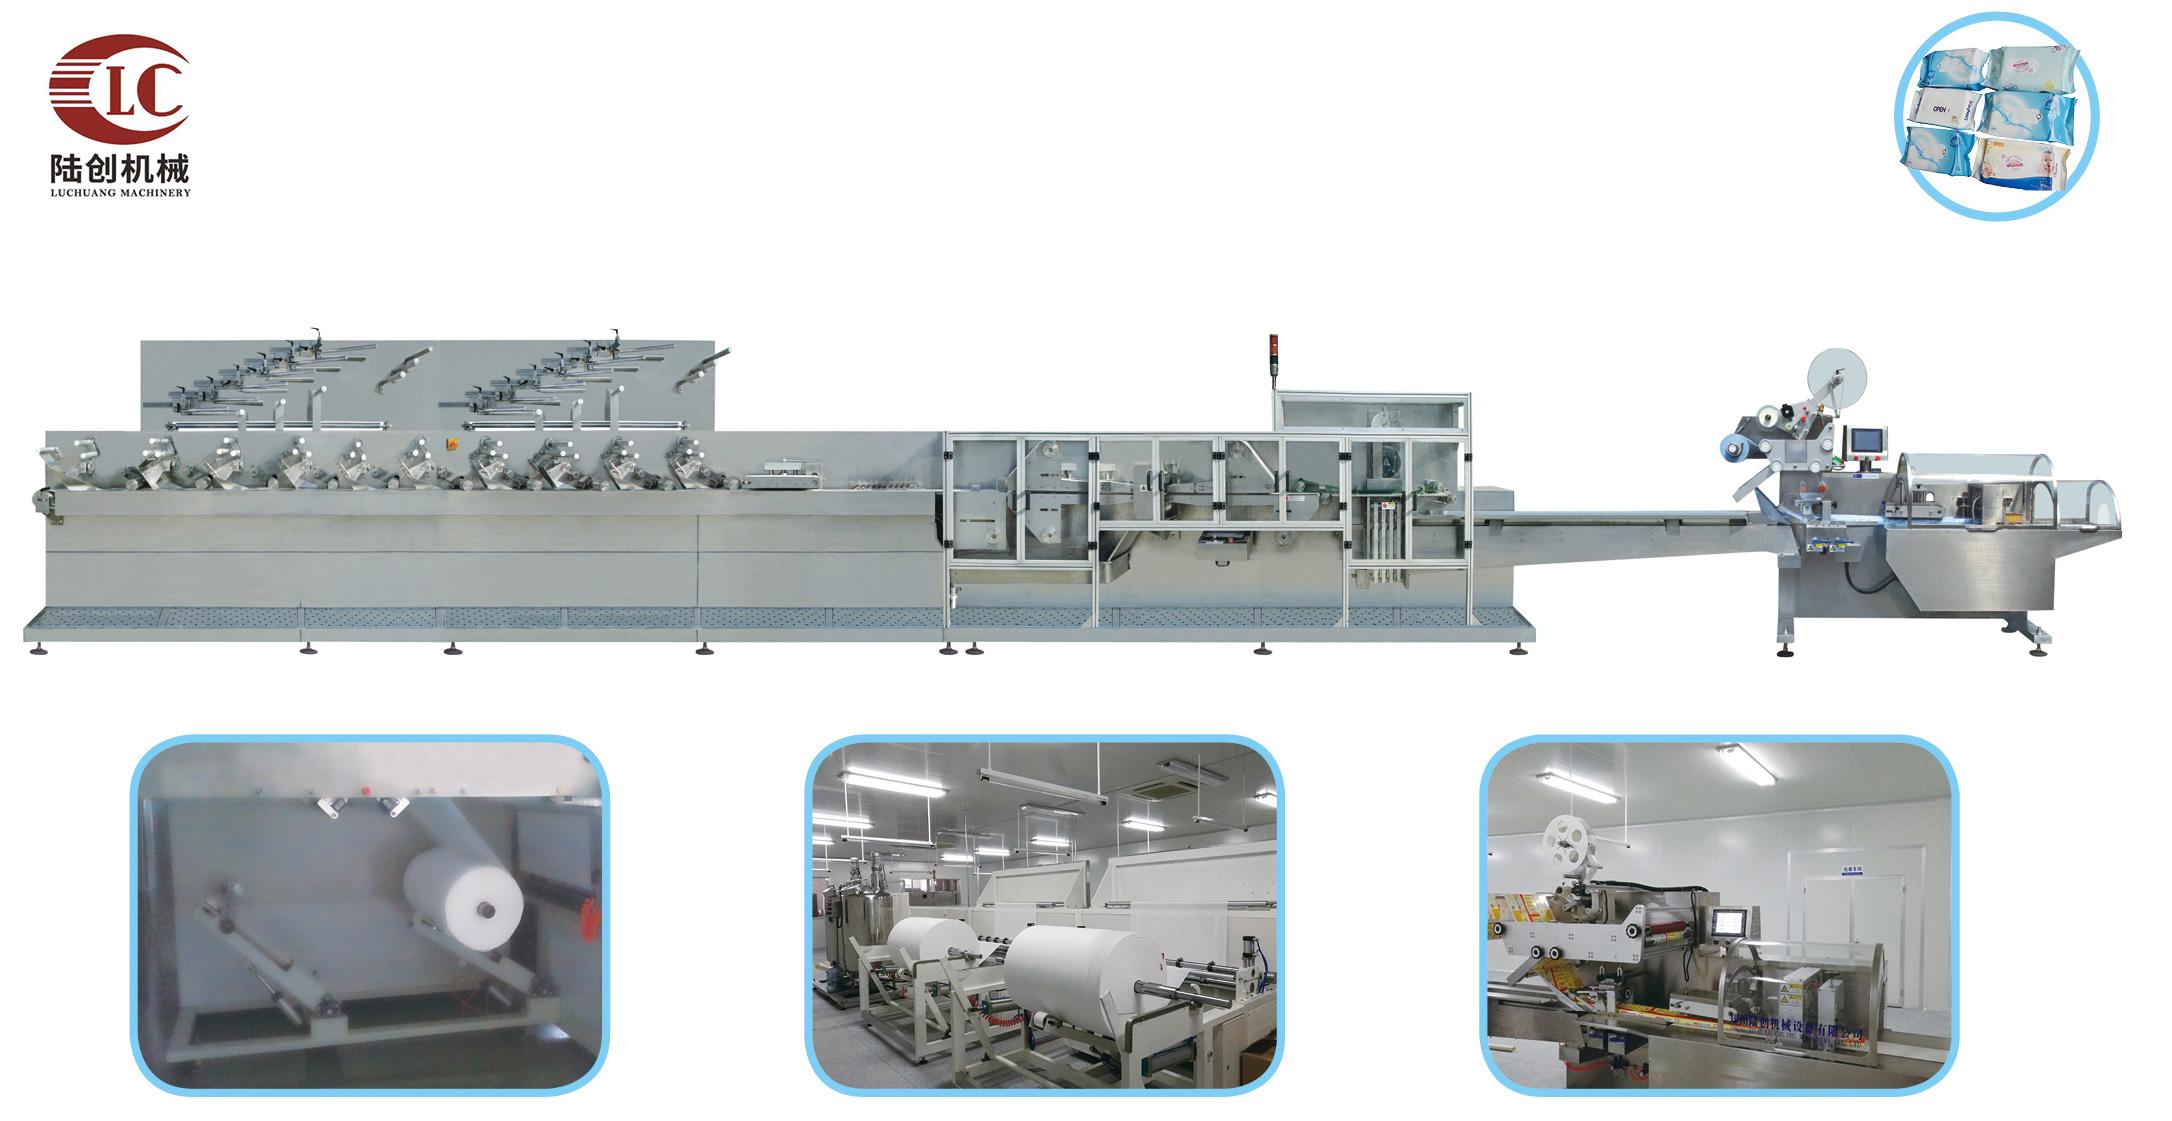 LC-BL10全自动湿巾生产线